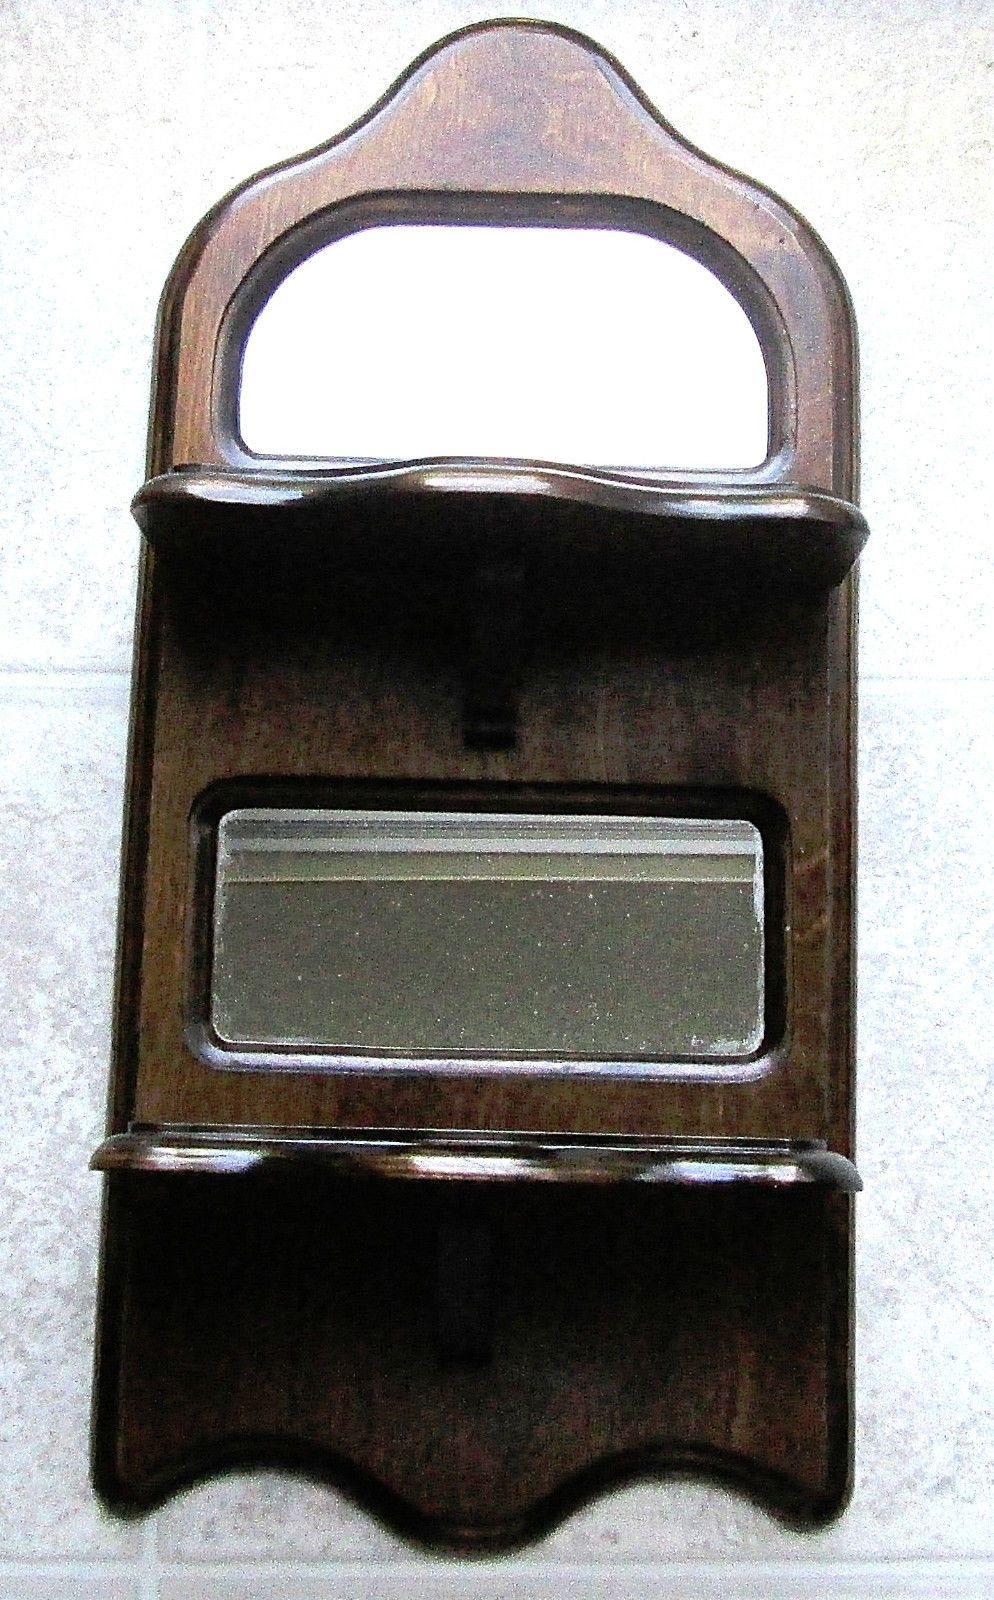 VINTAGE WOOD WALL HANGING SHELF - MIRRORED - 2 SHELVES - MOLENAAN   eBay